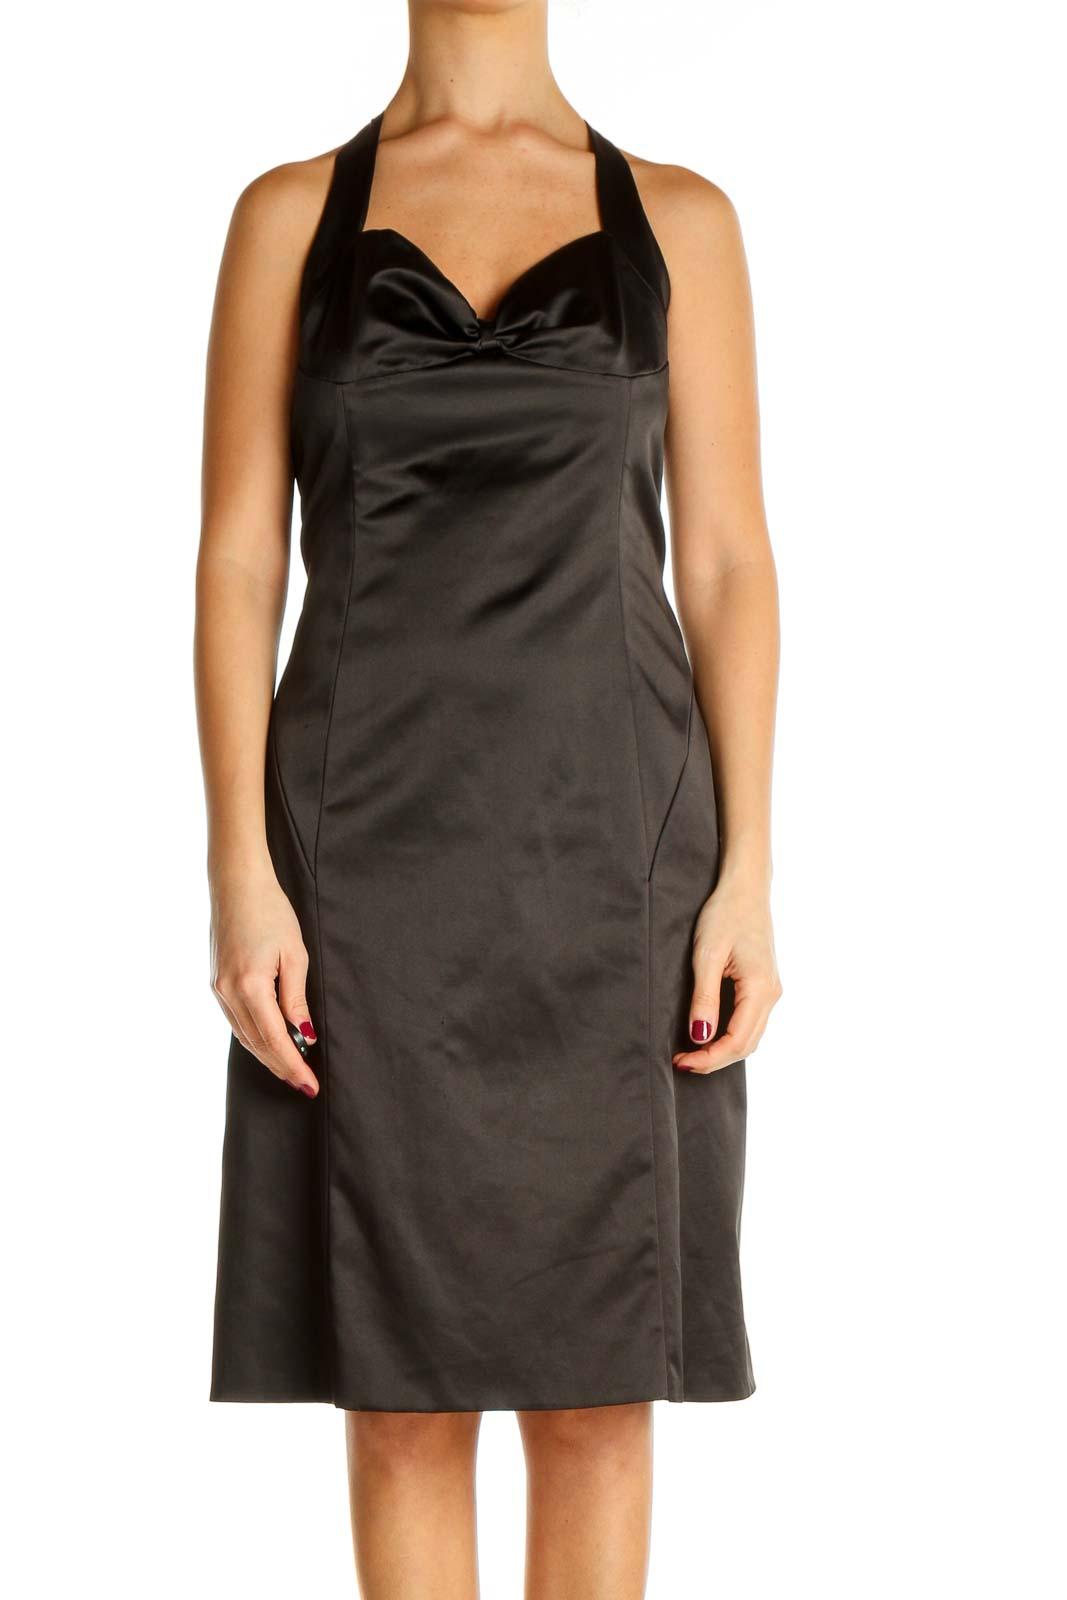 Black Solid Cocktail Sheath Dress Front